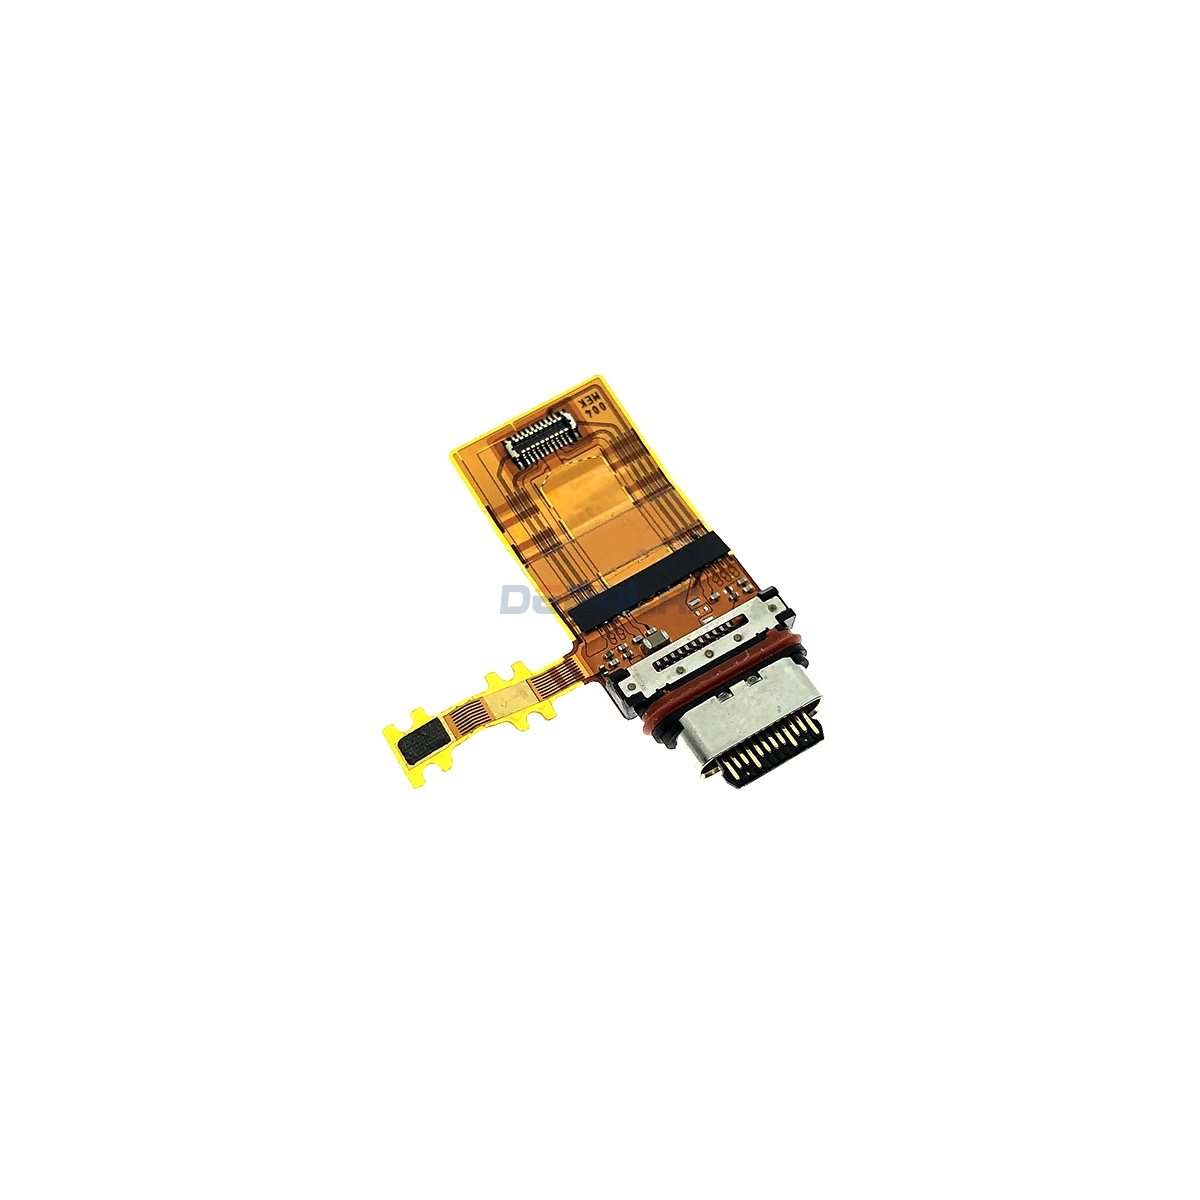 USB Plug Port Flex Cable for Repair Sony Xperia XZ1 Compact